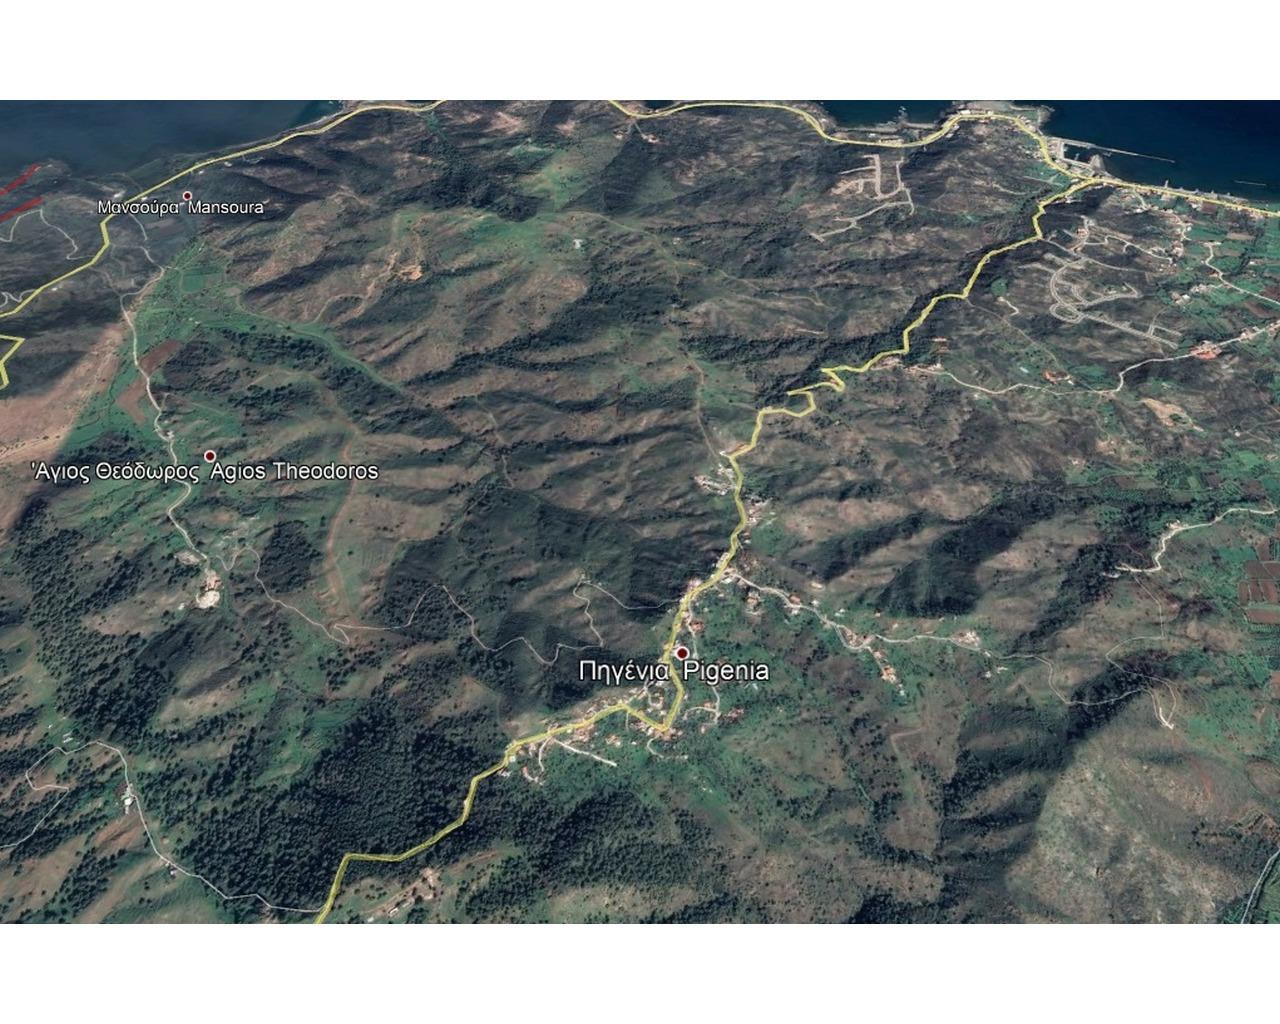 Land Nicosia(Pigenia)  631 SqMt for sale